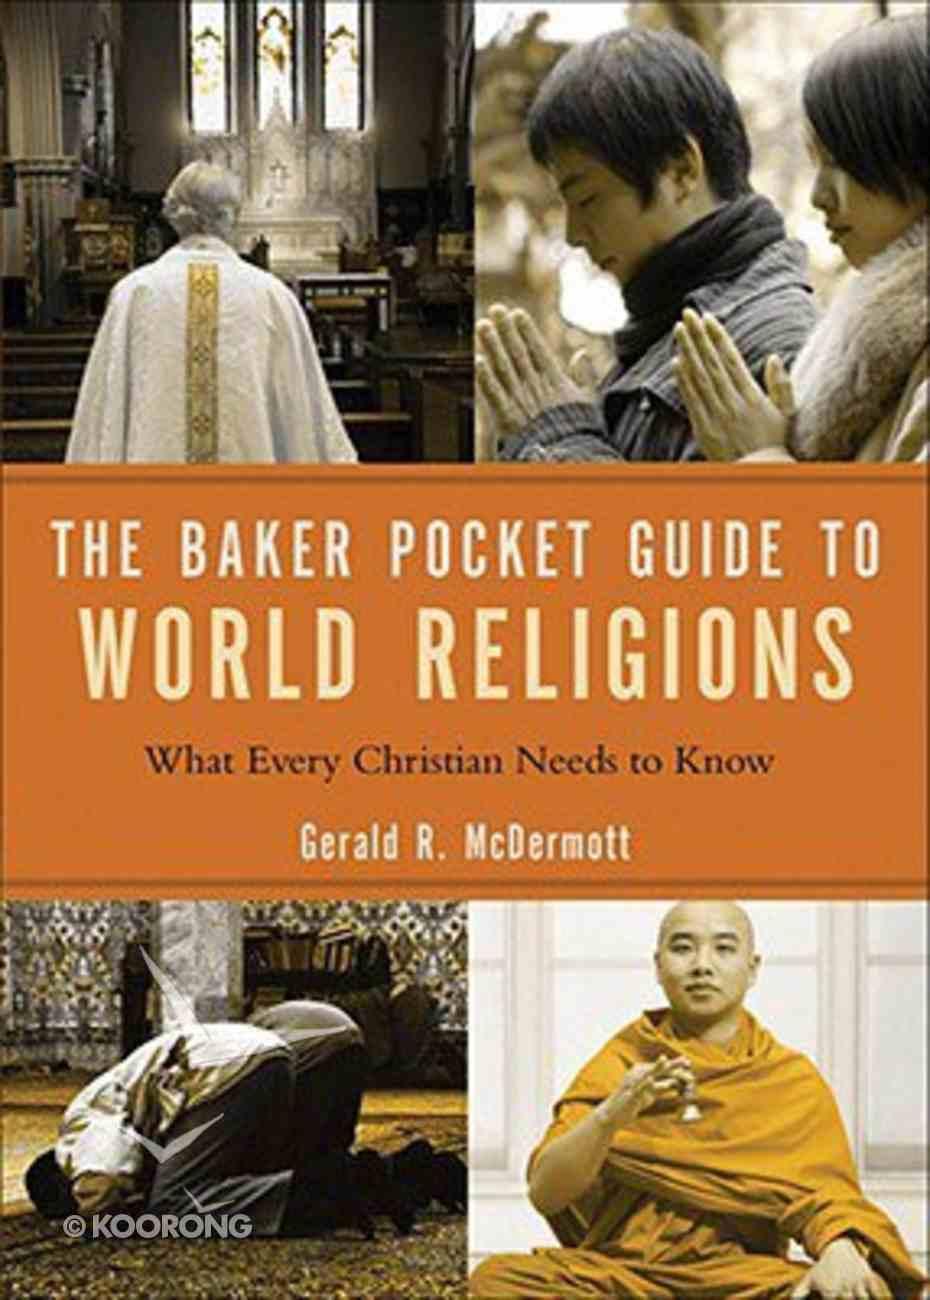 The Baker Pocket Guide to World Religions Paperback